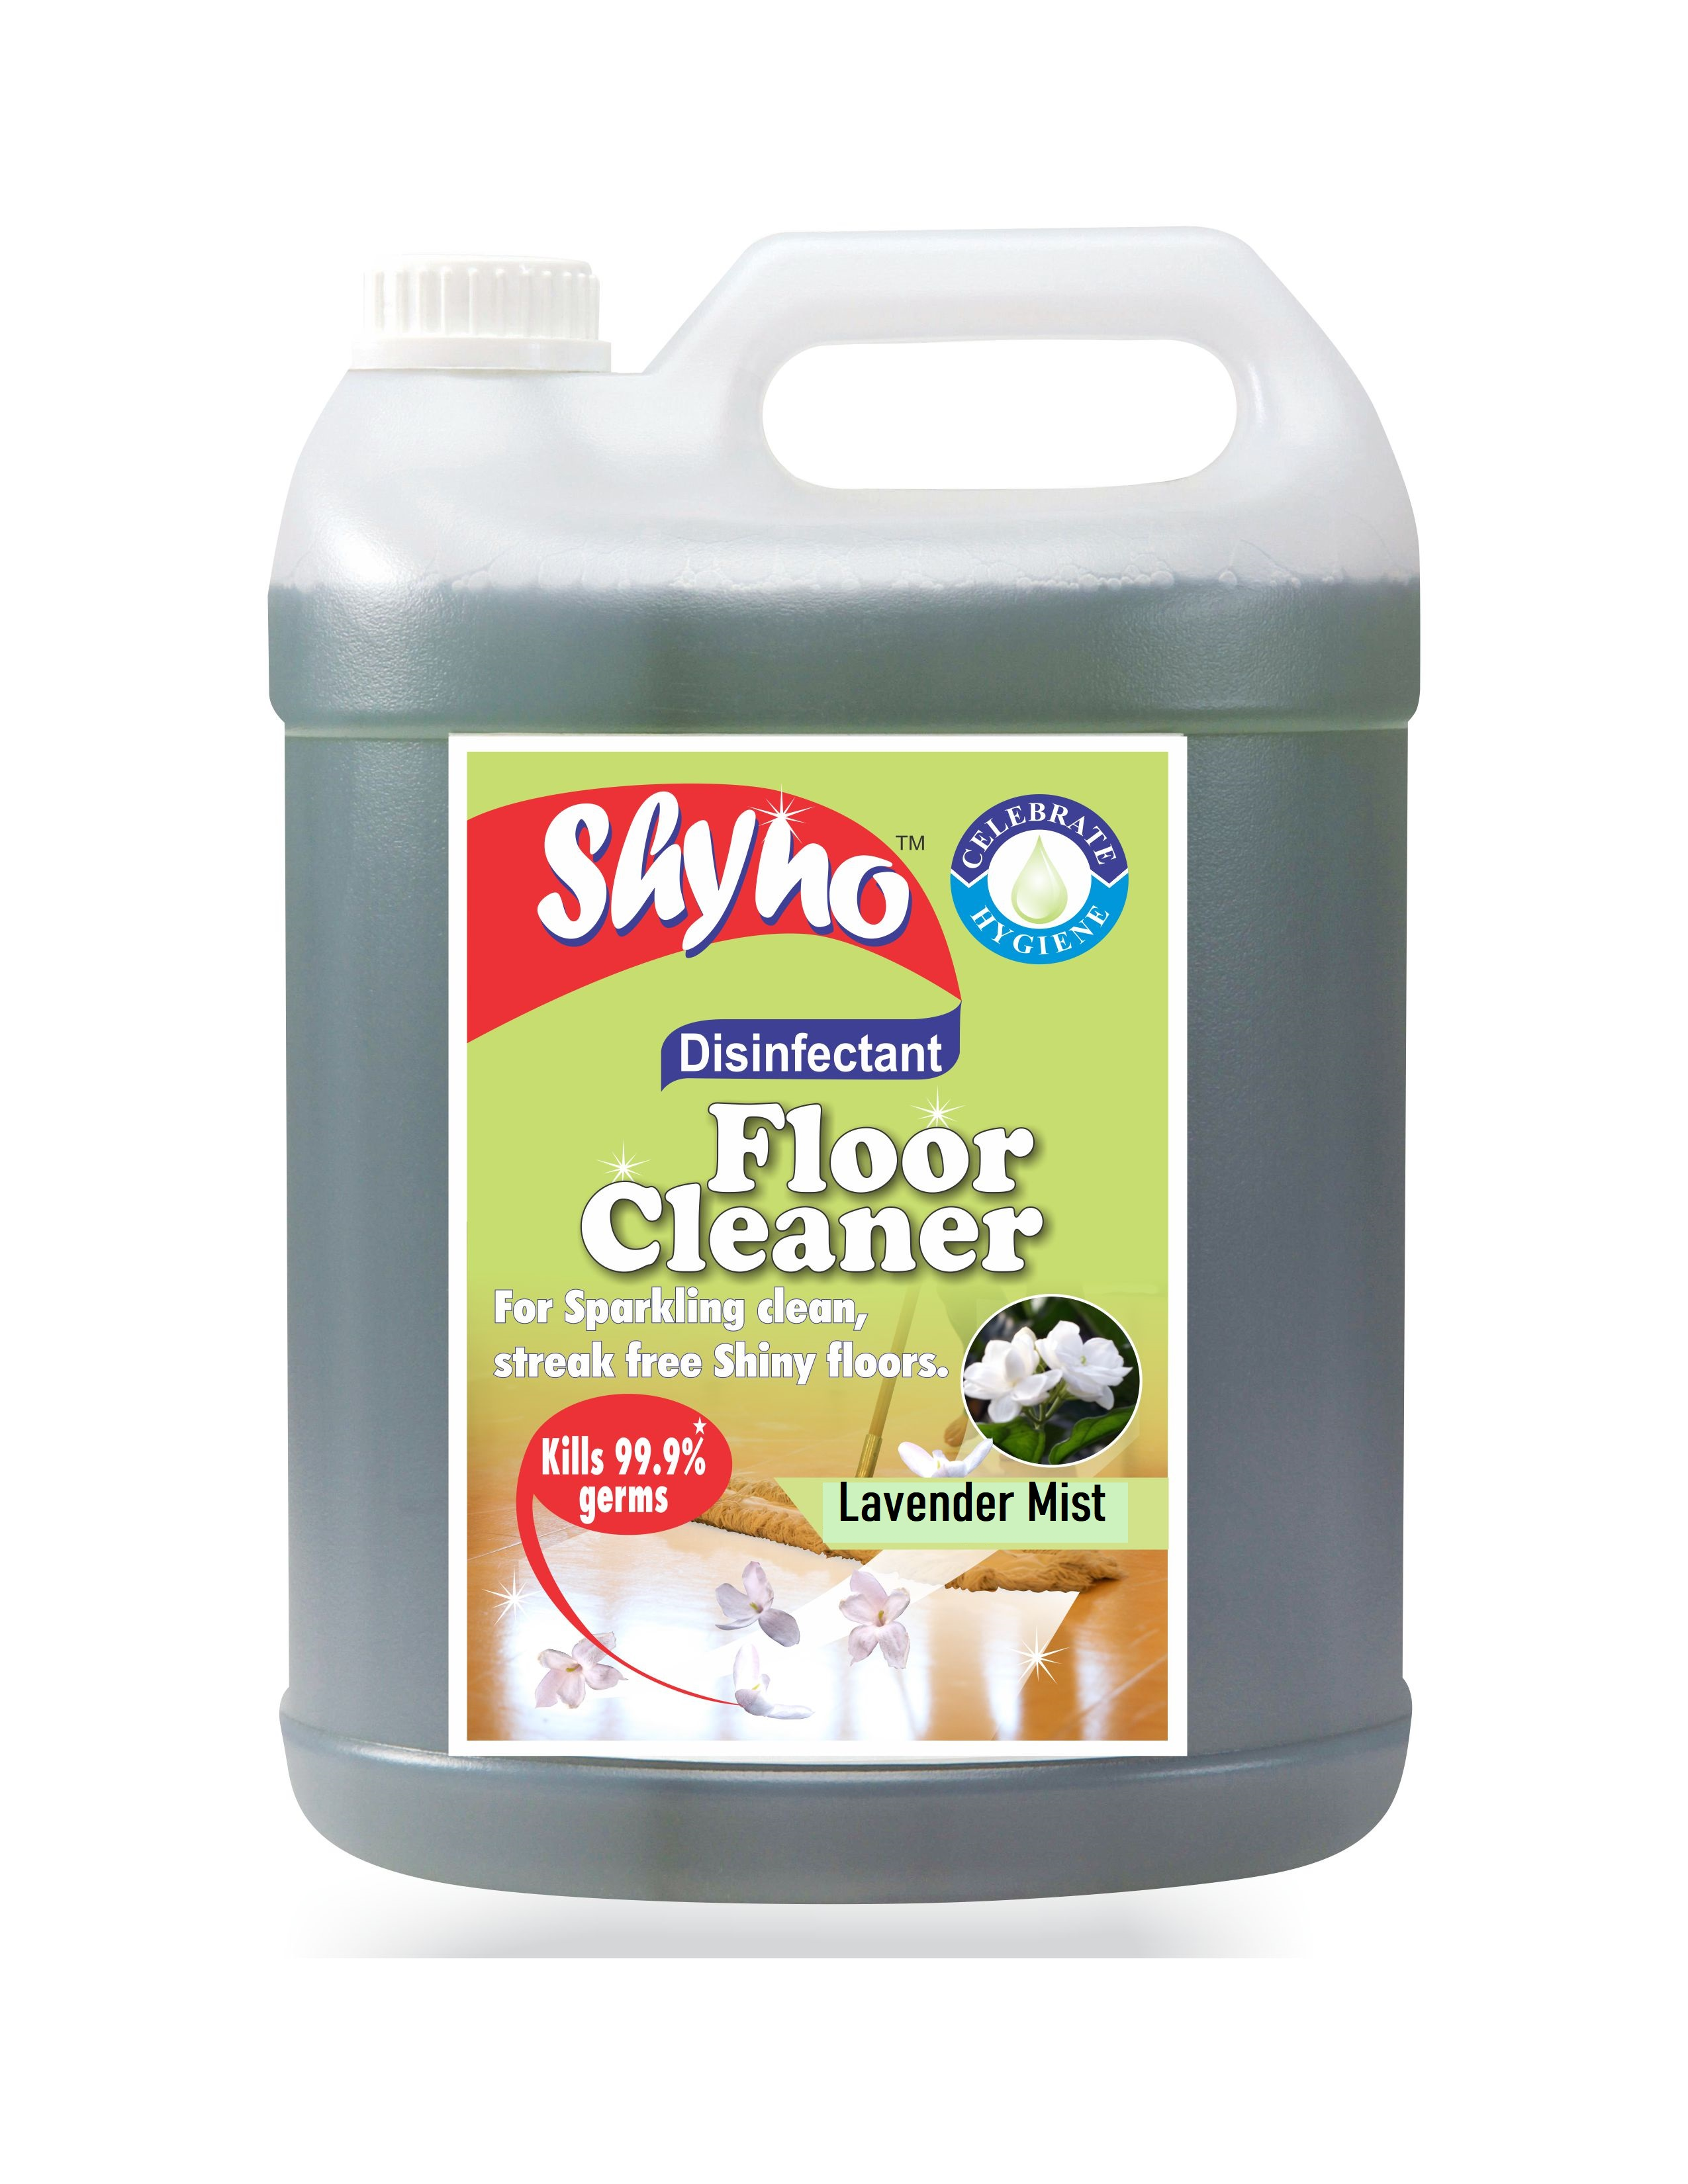 Shyno Disinfectant Floor Cleaner - 5 Litres, Lavender Mist